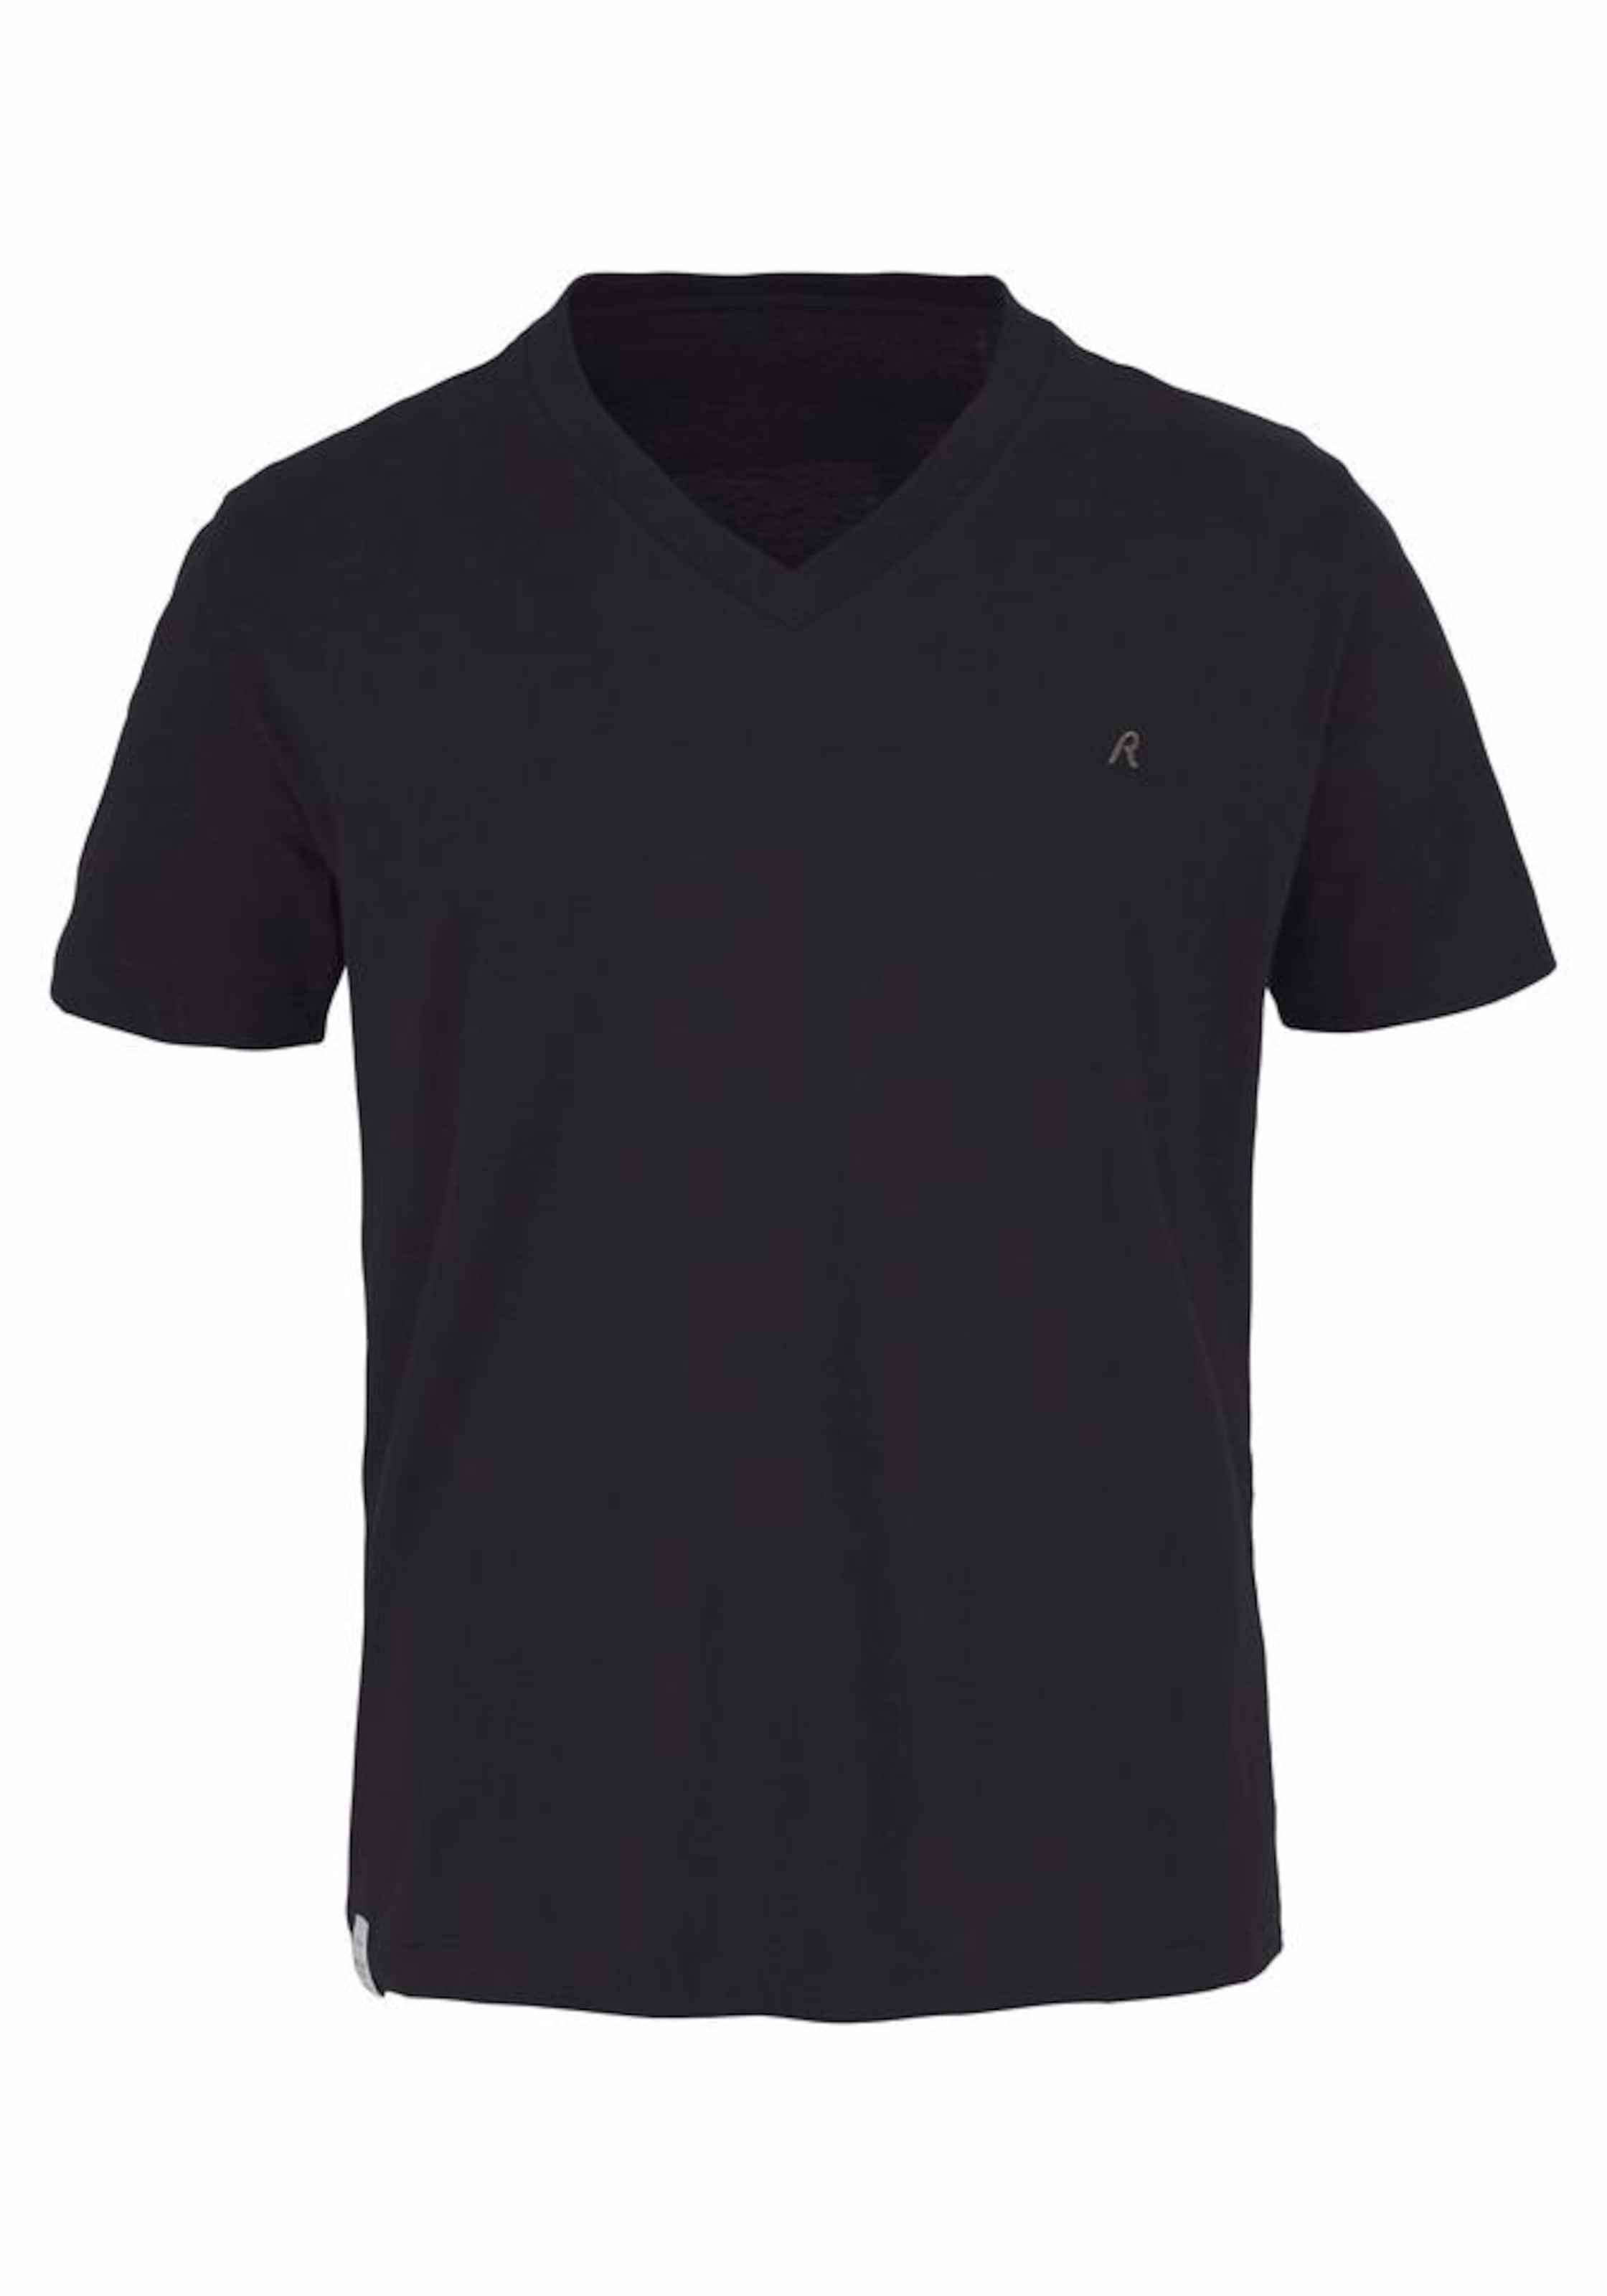 Verkauf Der Billigsten Geschäft REPLAY V-Shirt (2 Stück) Wiki Verkauf Online Größte Anbieter Günstiger Preis Billiger Blick QPaizW